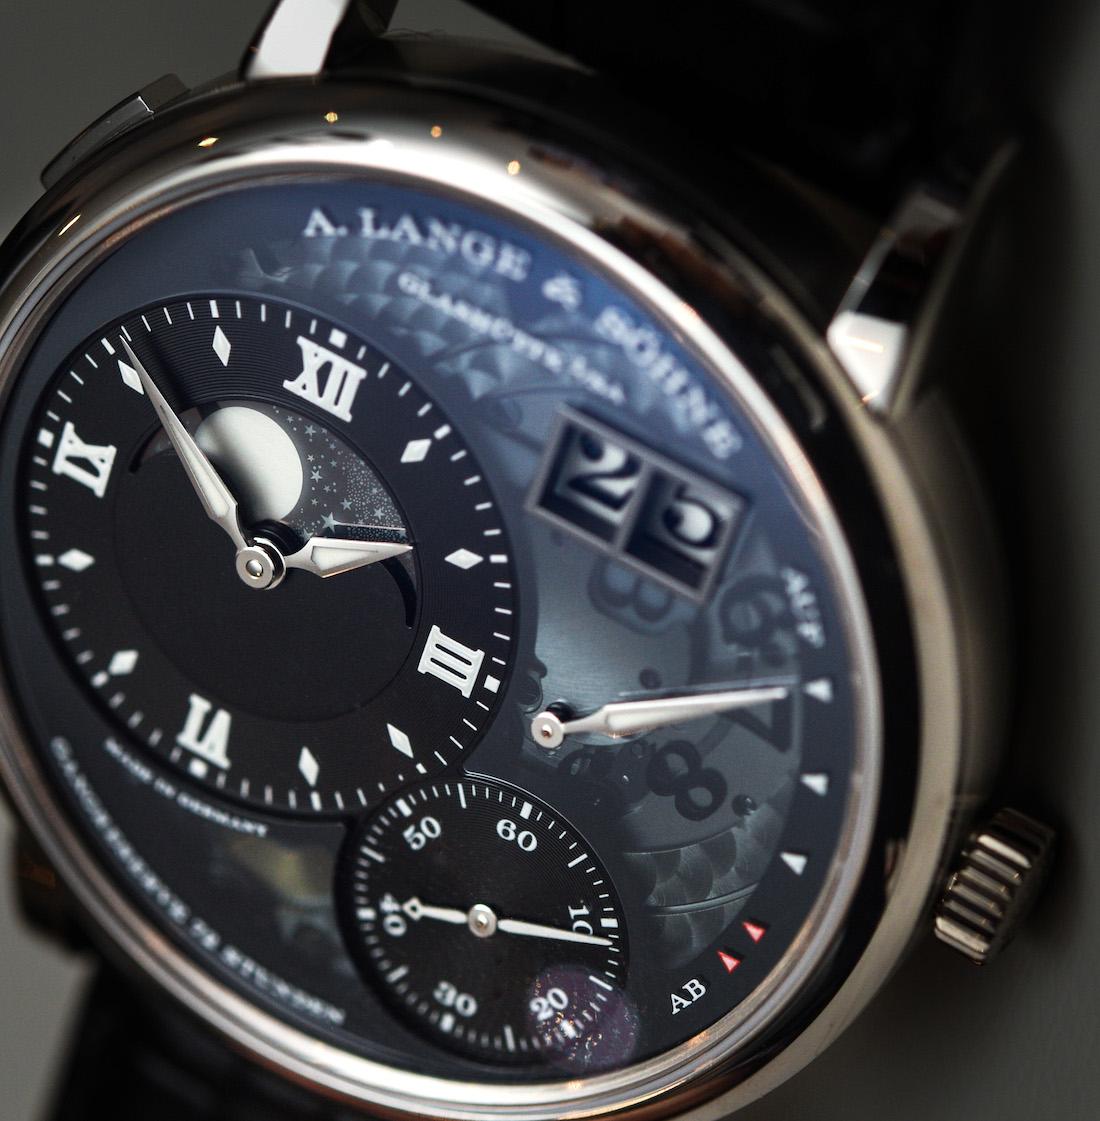 A-Lange-Sohne-Grand-Lange-1-Moon-Phase-Lumen-aBlogtoWatch-14